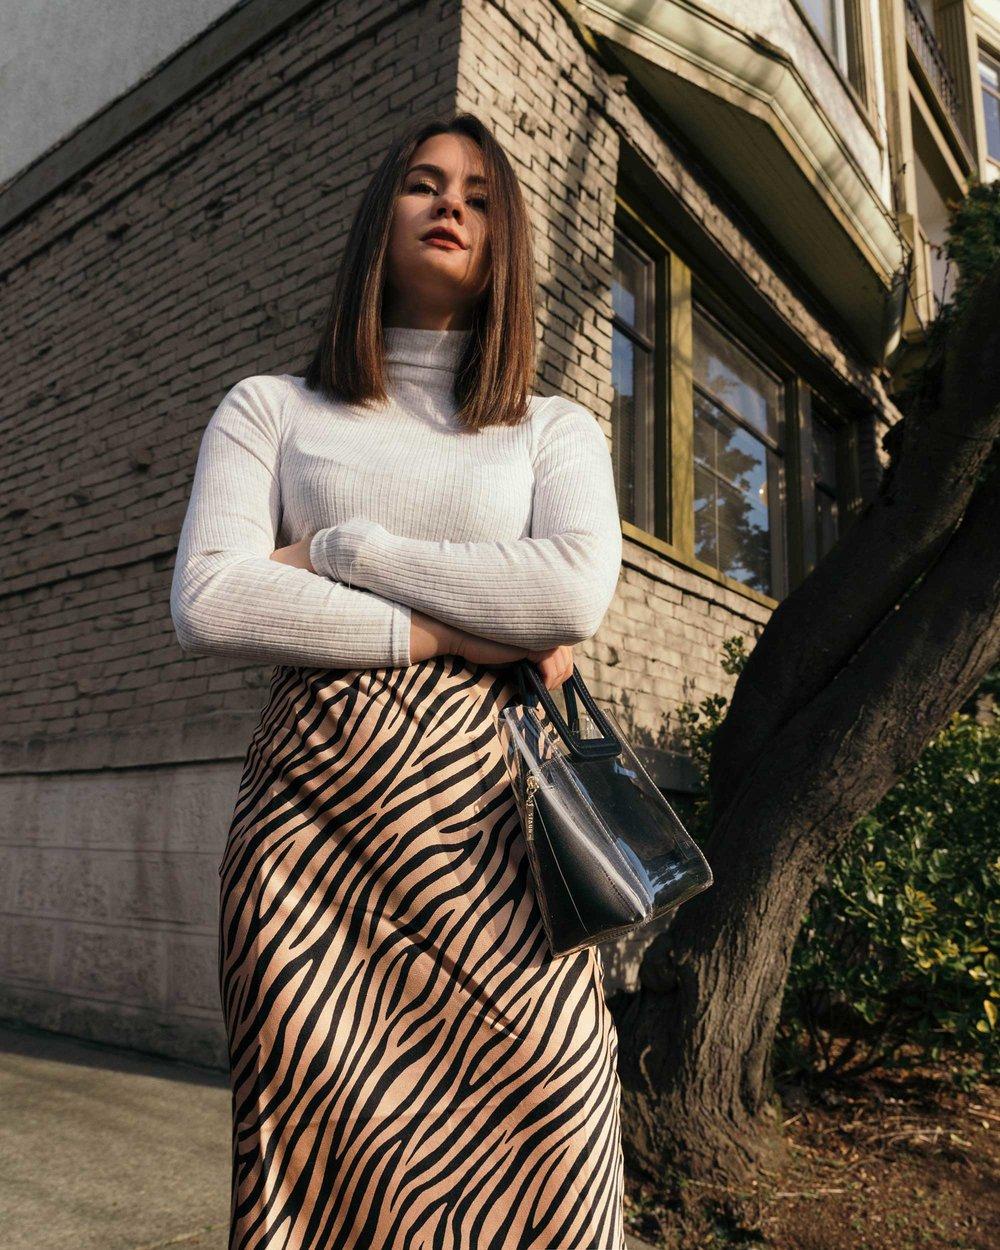 Sarah Butler of Sarah Styles Seattle wears Club Monaco Julie Rib Turtleneck Sweater, Tiger Print Midi Skirt, and Staud Mini Shirley Transparent Handbag | @sarahchristine1.jpg